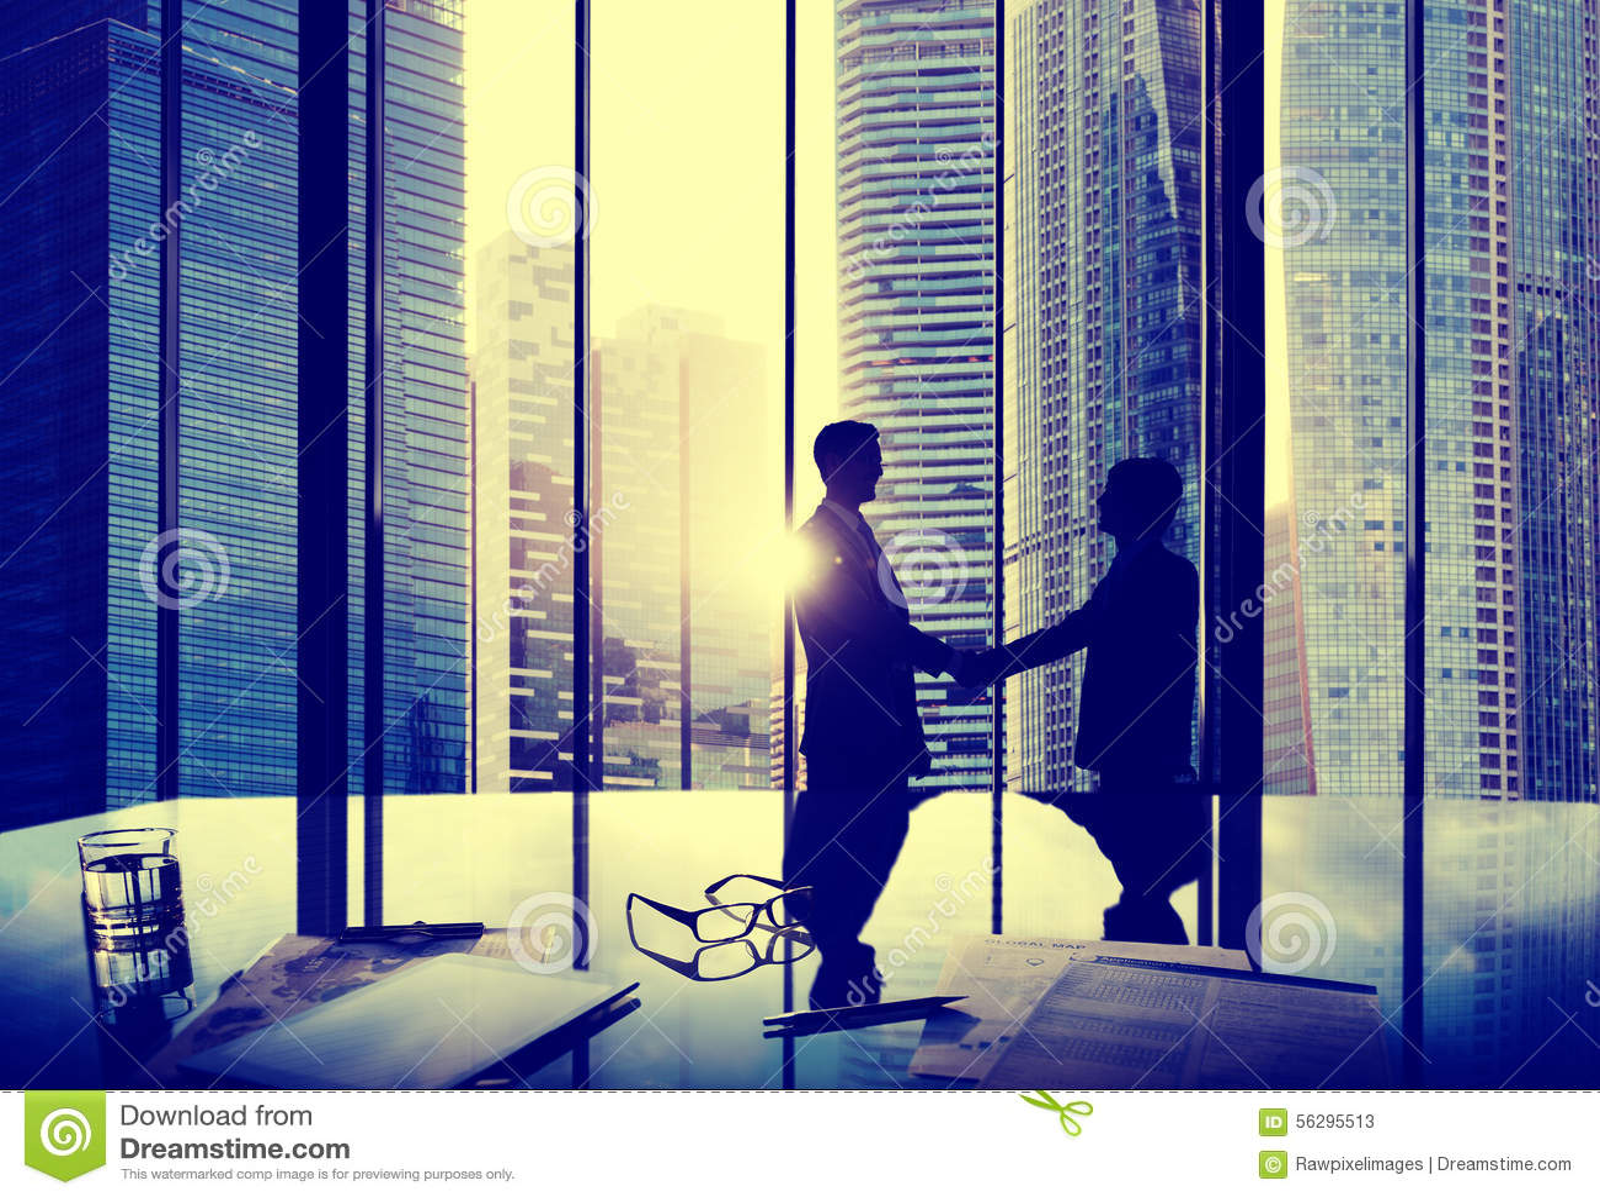 Business Handshake Agreement Partnership Deal Team Office Concep